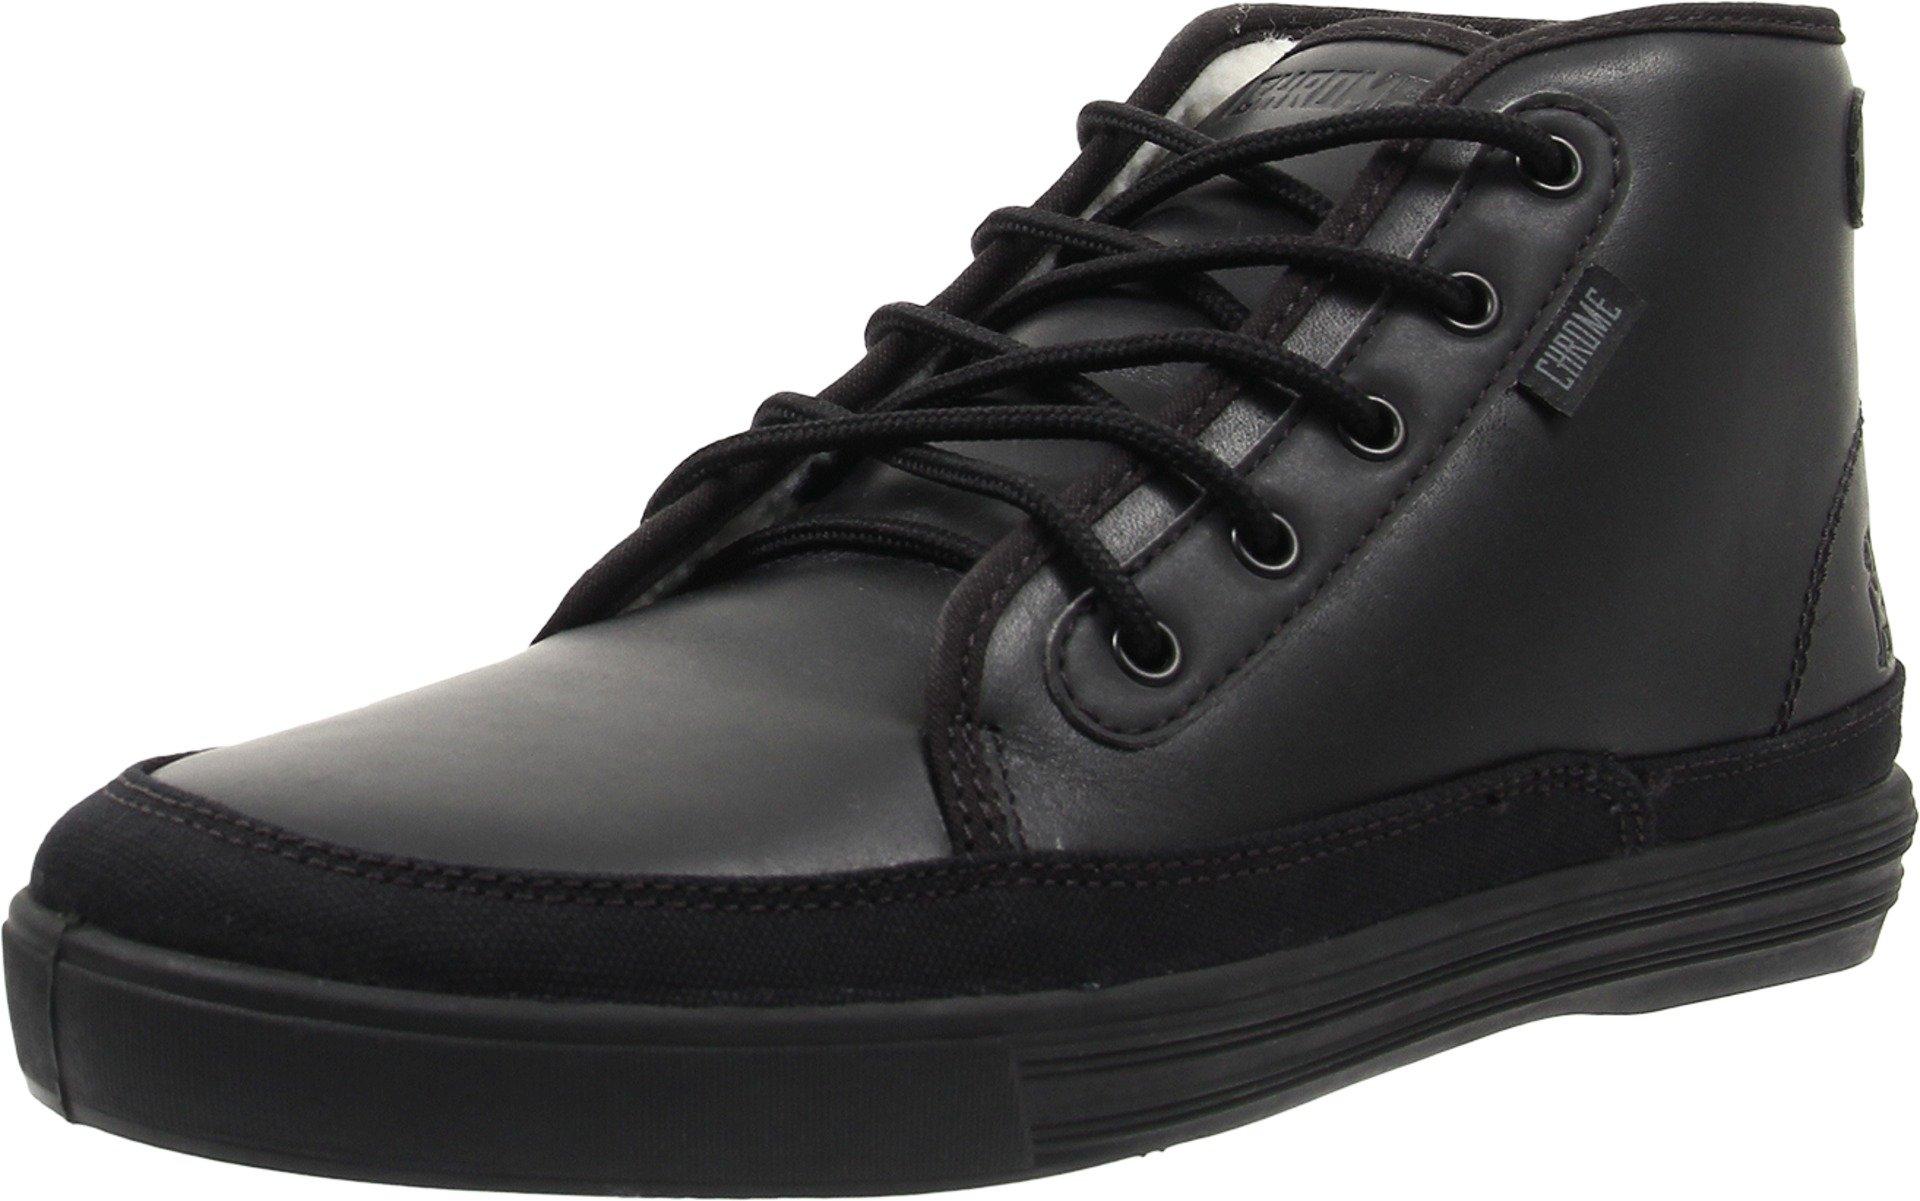 Chrome Unisex Peshka Black Leather 11.5 Women/10 Men M US